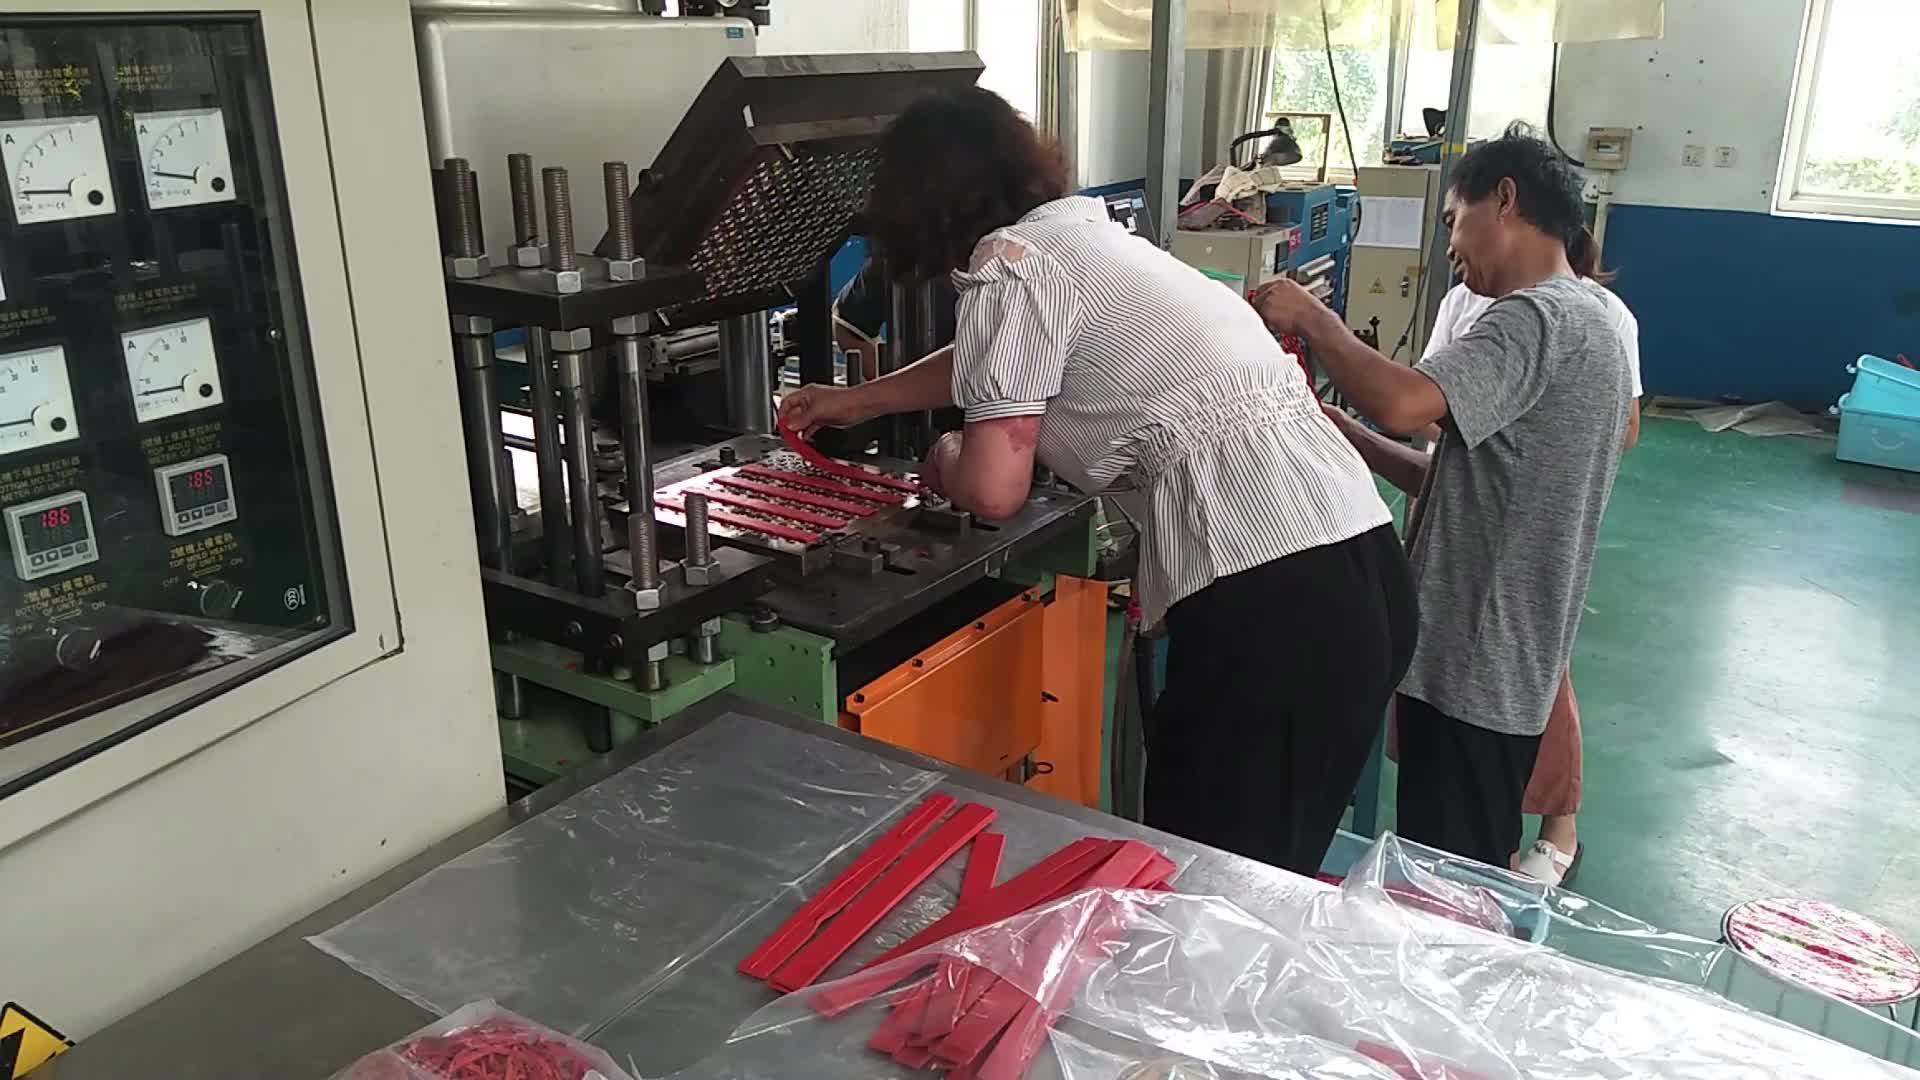 Chuangcheng guarnizione in gomma di silicone produttore